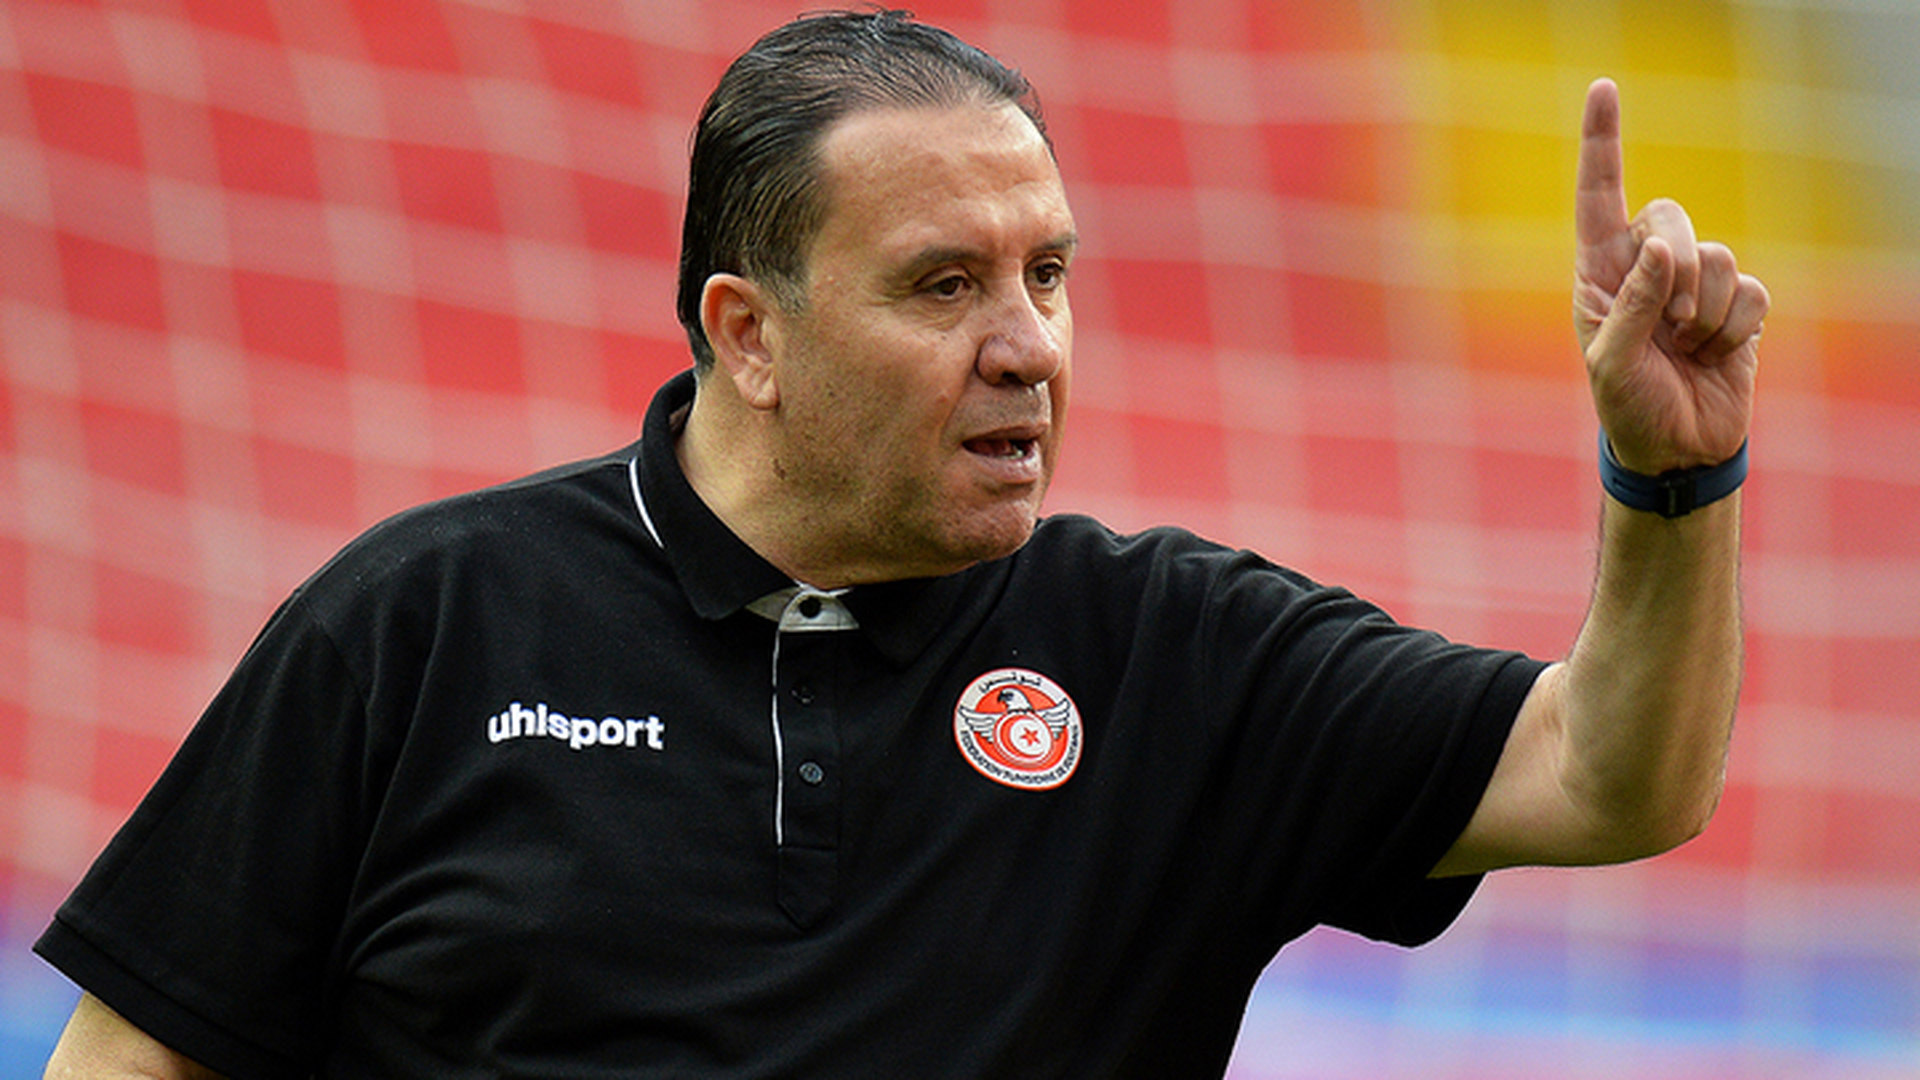 Тренер Туниса Маалул покинул свой пост после чемпионата мира-2018